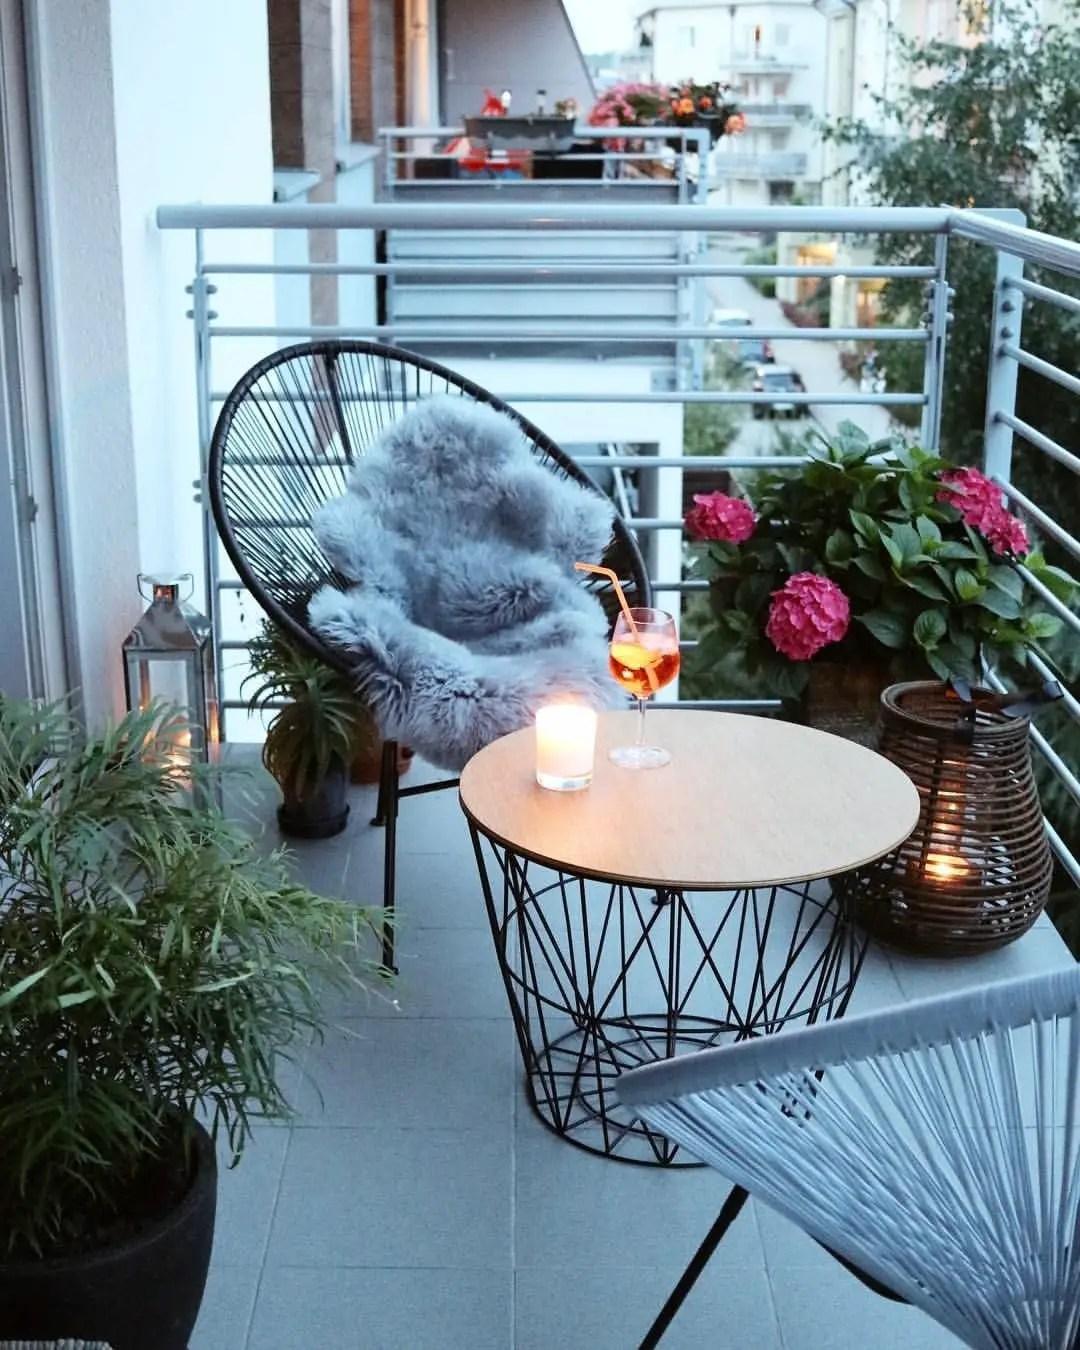 Creative small balcony design ideas for spring 16